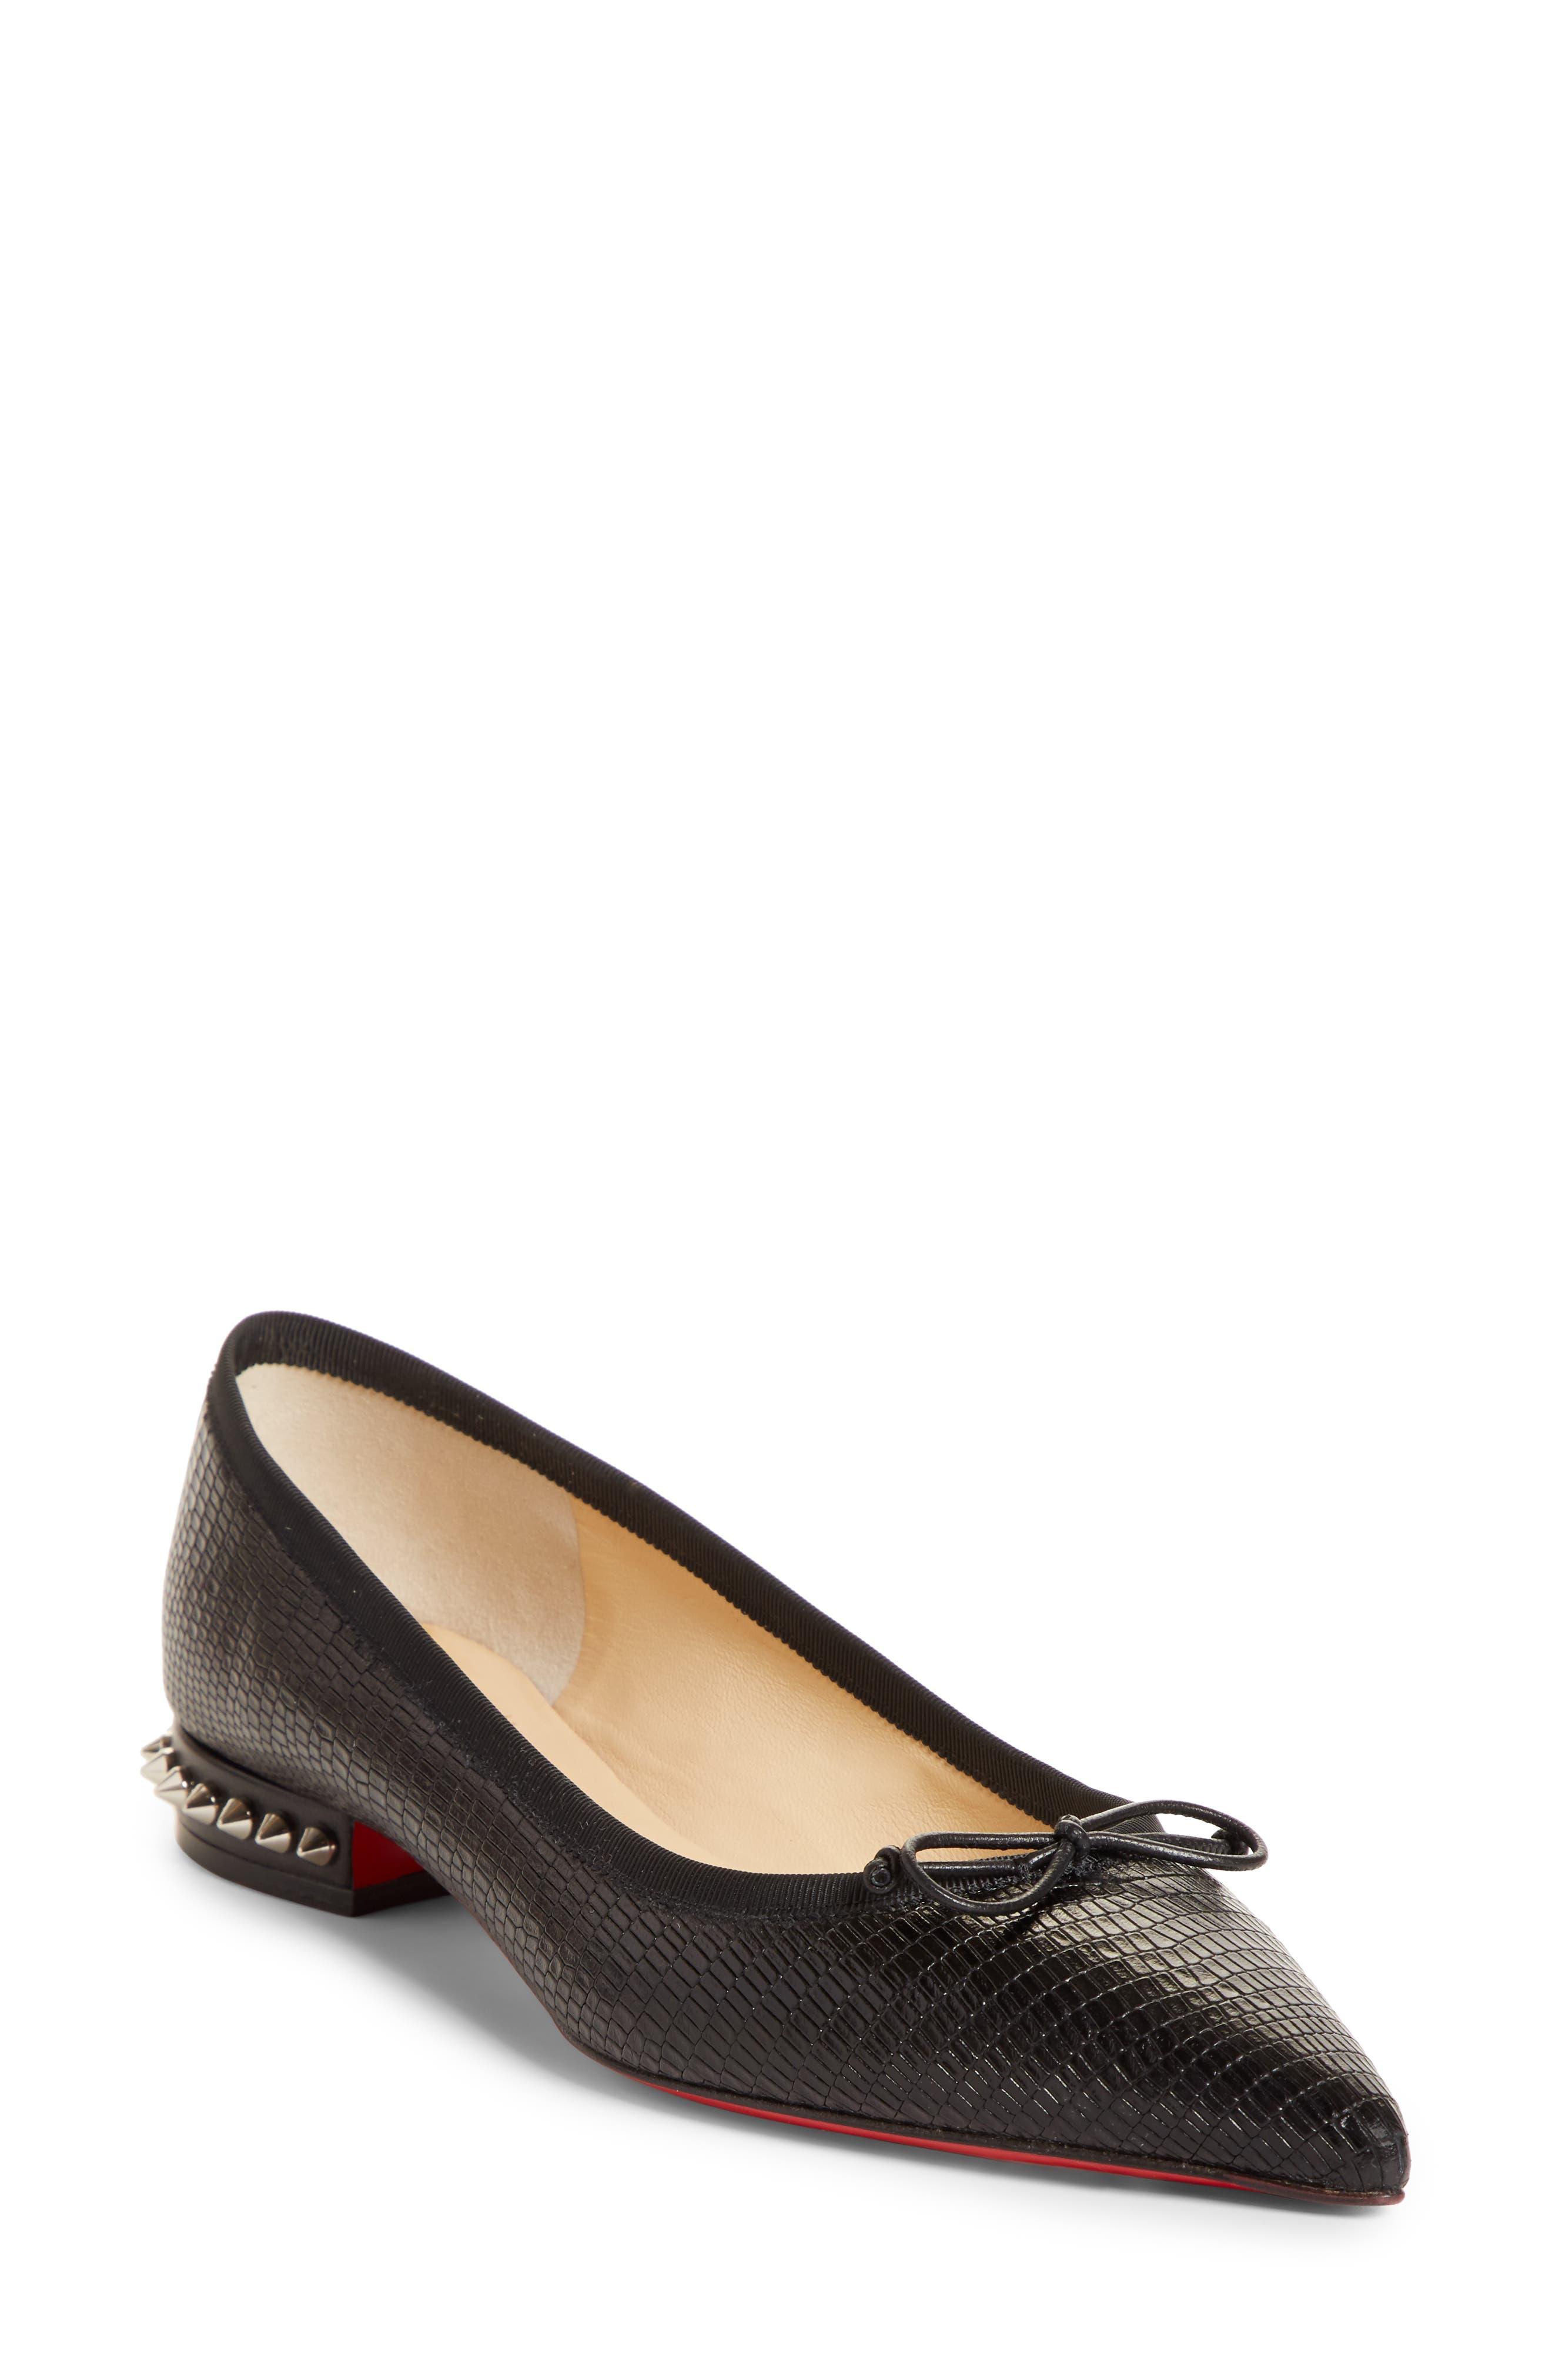 Christian Louboutin Spike Heel Flat, Black